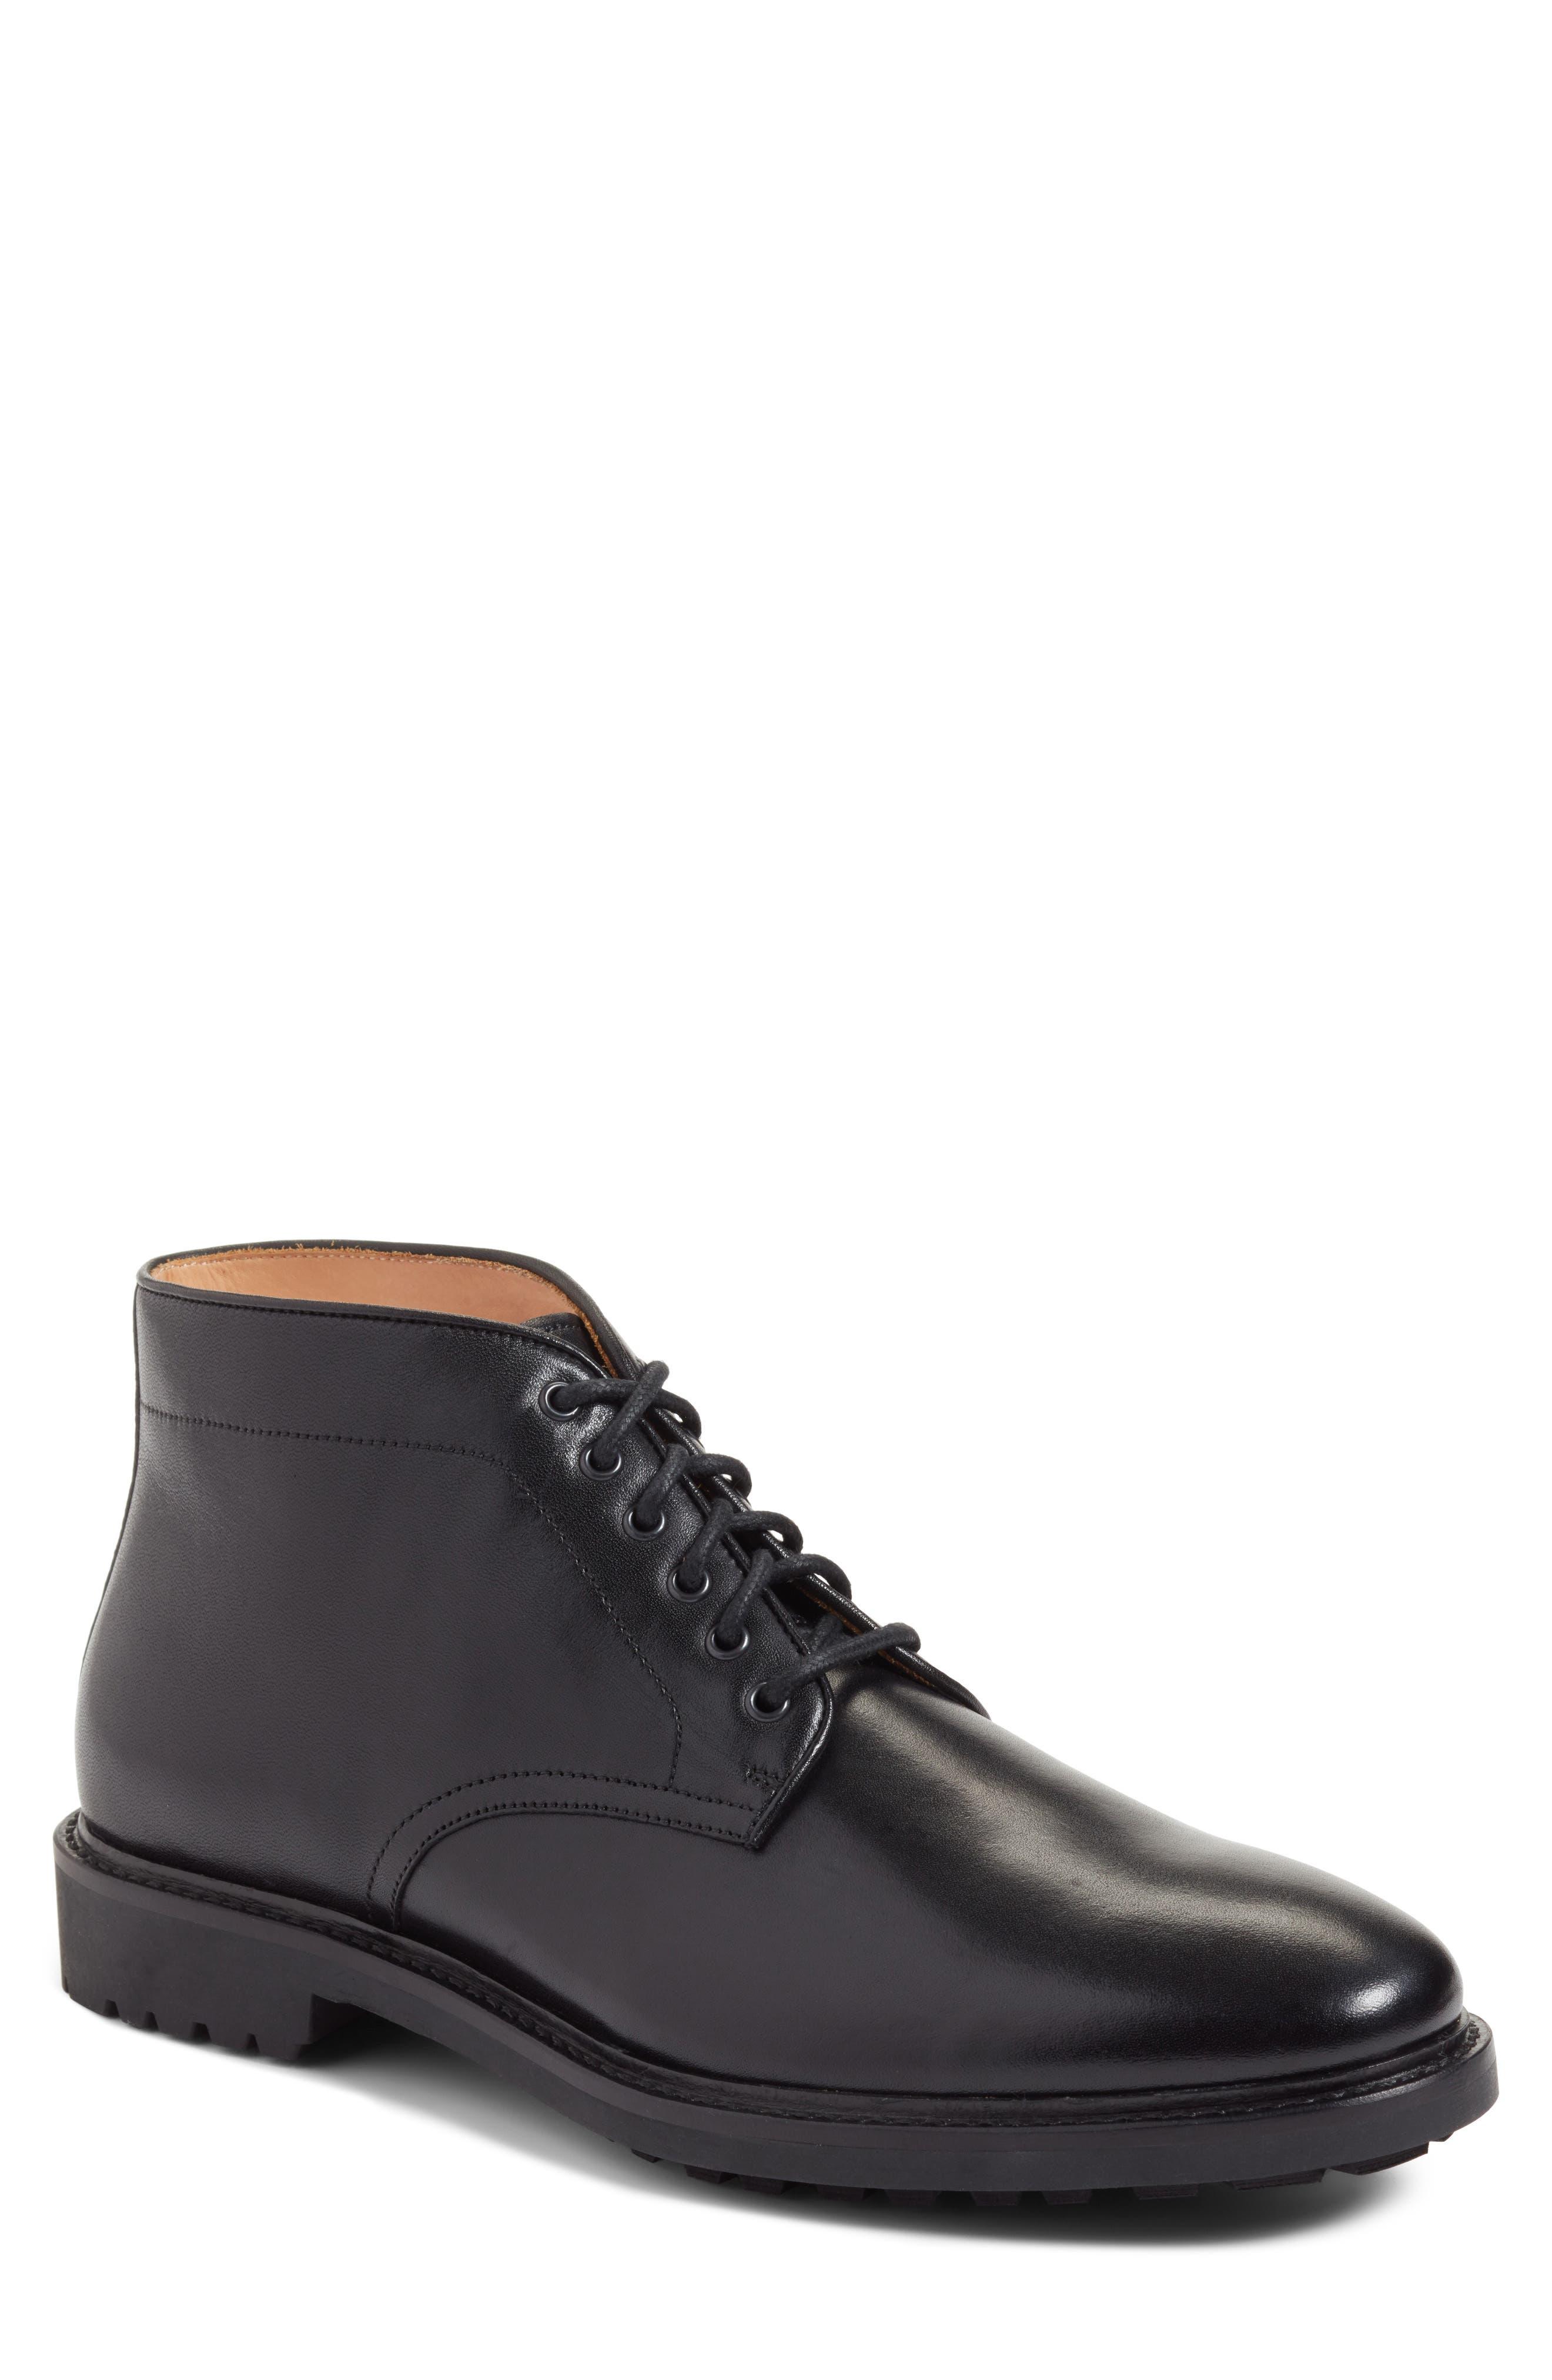 Alternate Image 1 Selected - John W. Nordstrom® Ramiro Plain Toe Boot (Men)